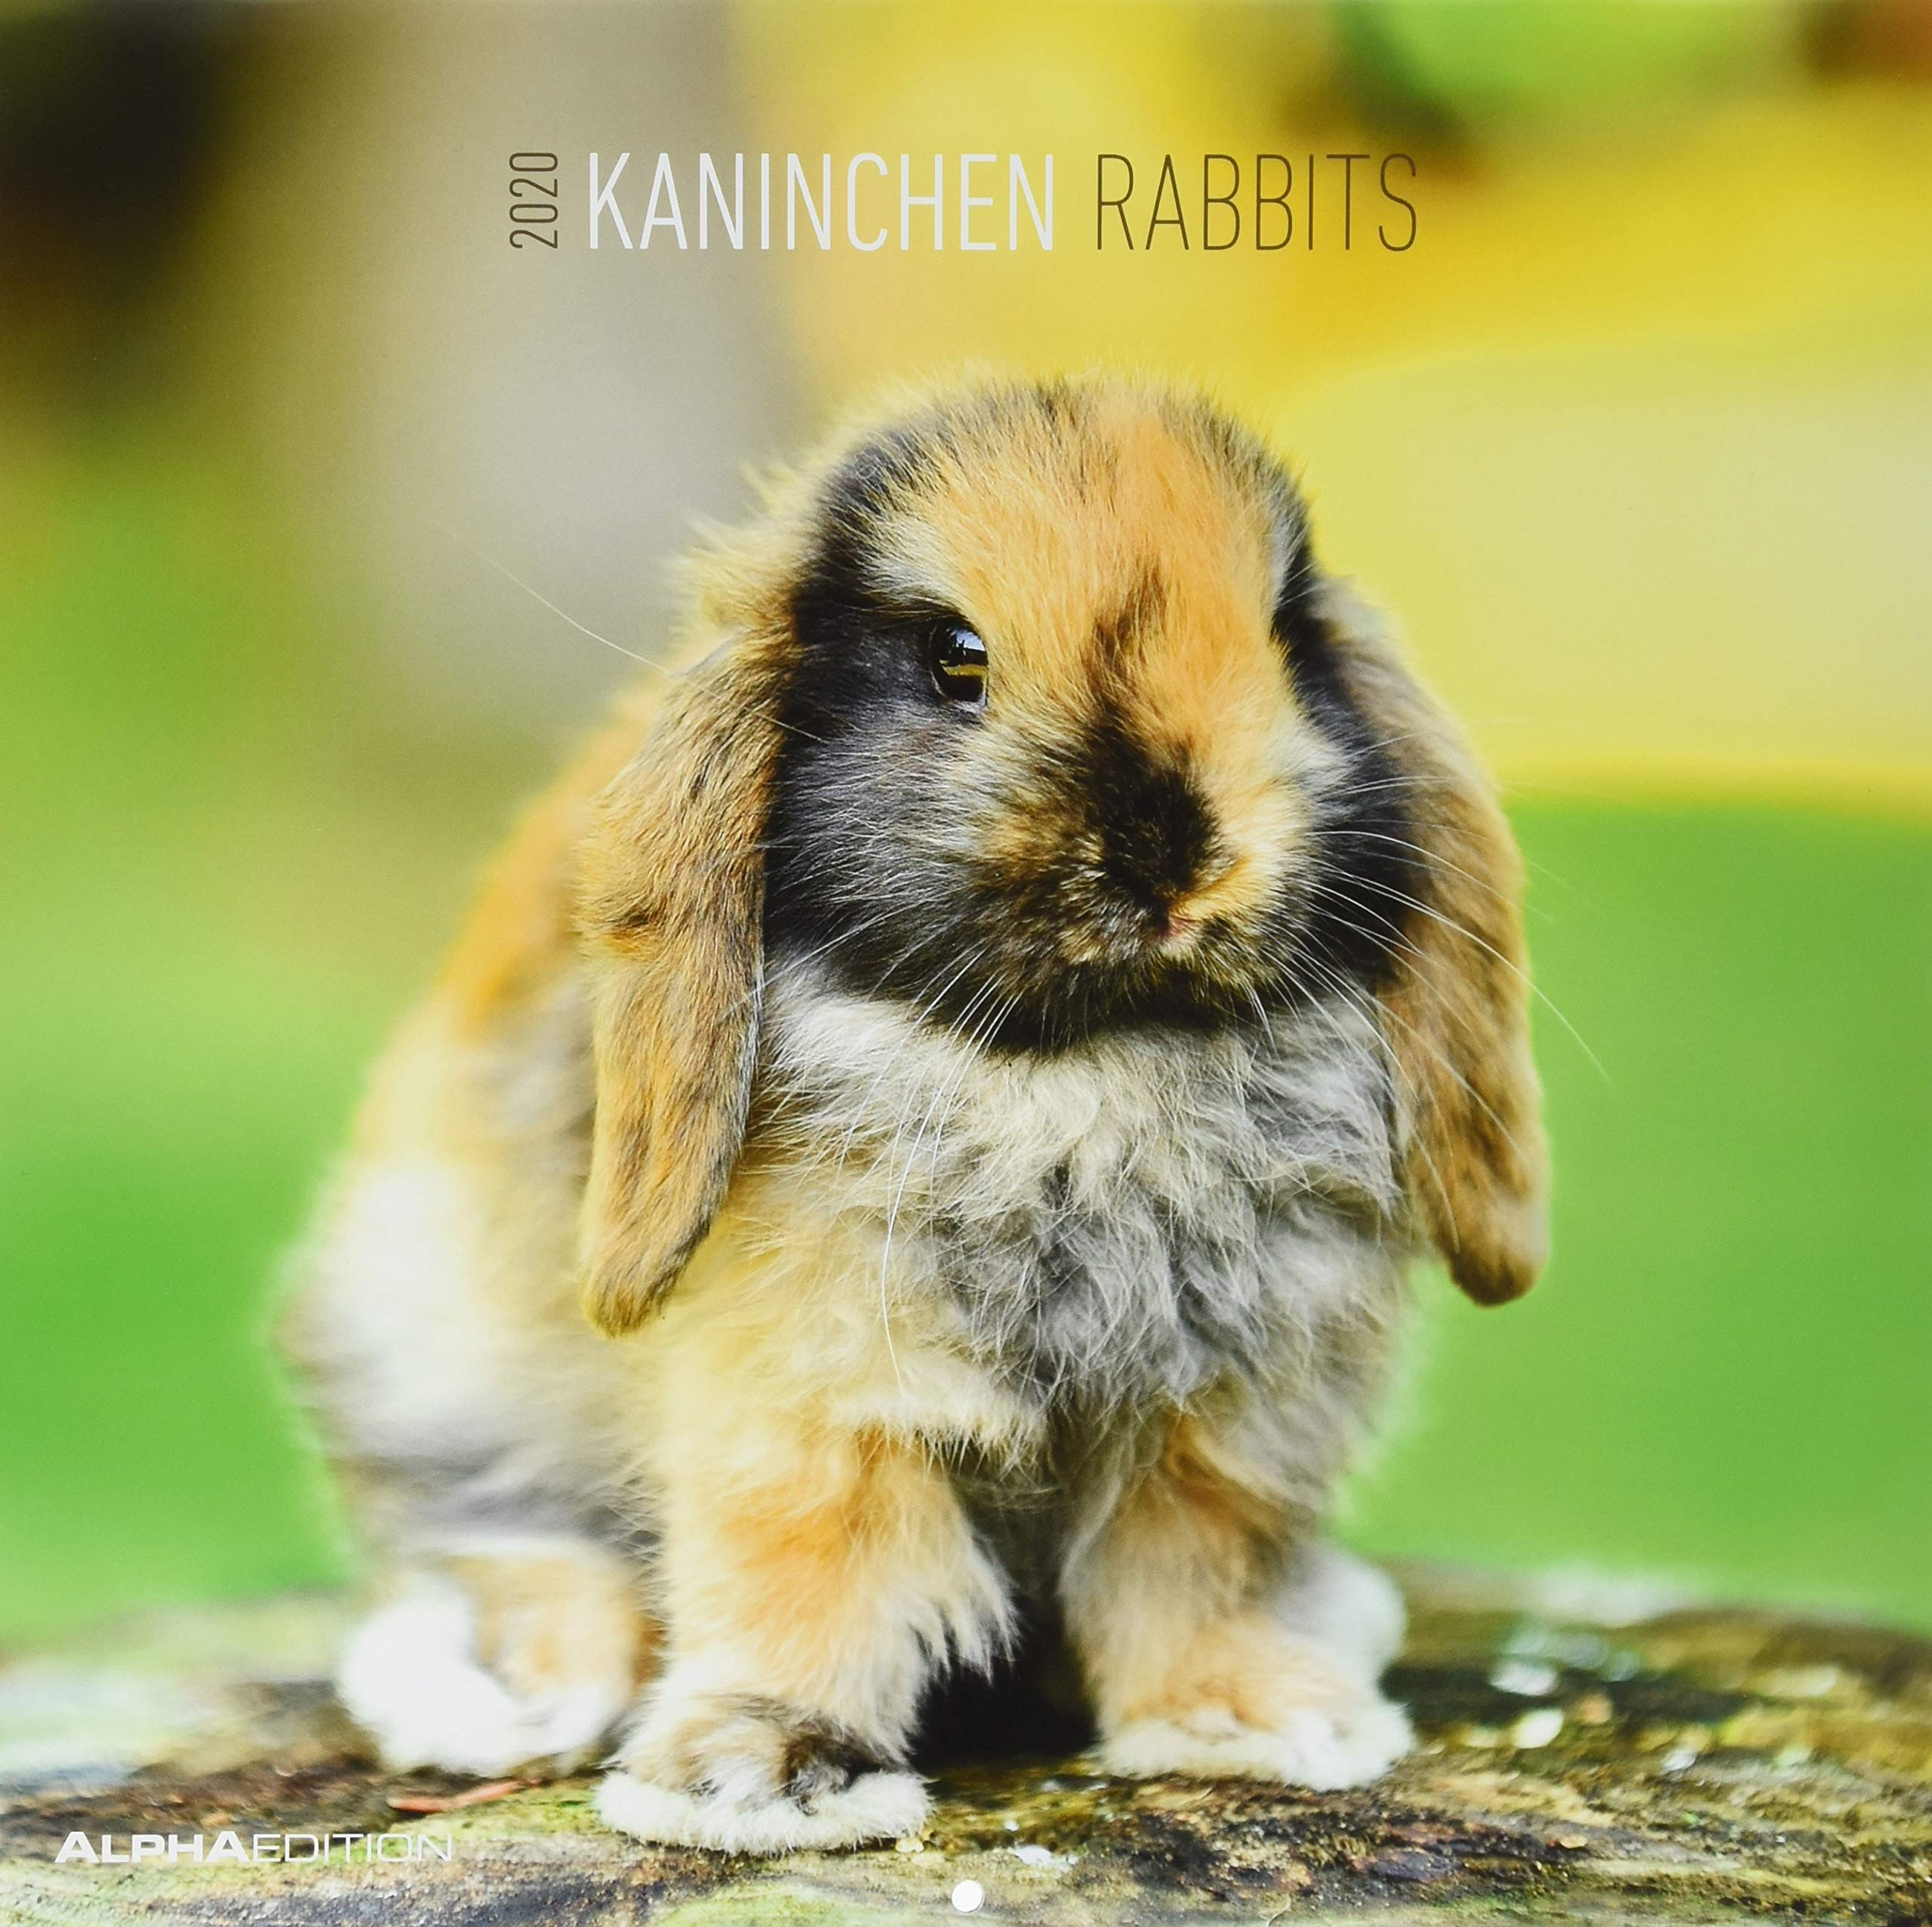 Kaninchen 2020   Rabbits   Wandkalender   Broschürenkalender  30 X 60 Geöffnet    Tierkalender   Wandplaner